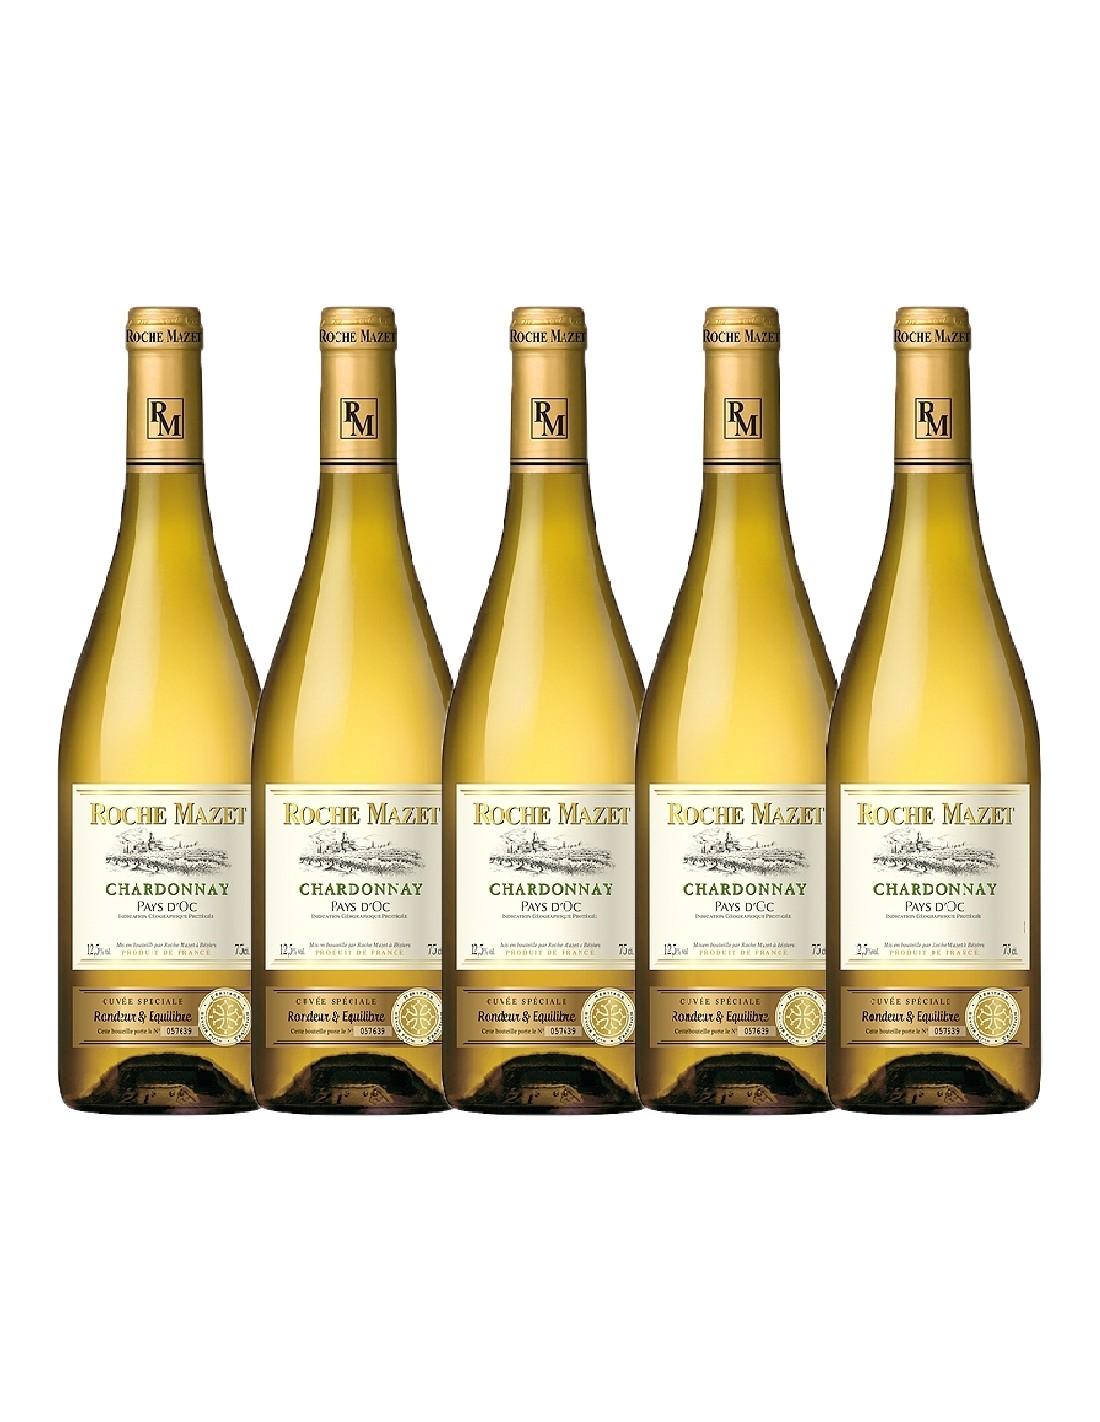 Pachet 5 sticle Vin alb, Chardonnay, Roche Mazet Pays dOc, 0.75L, Franta